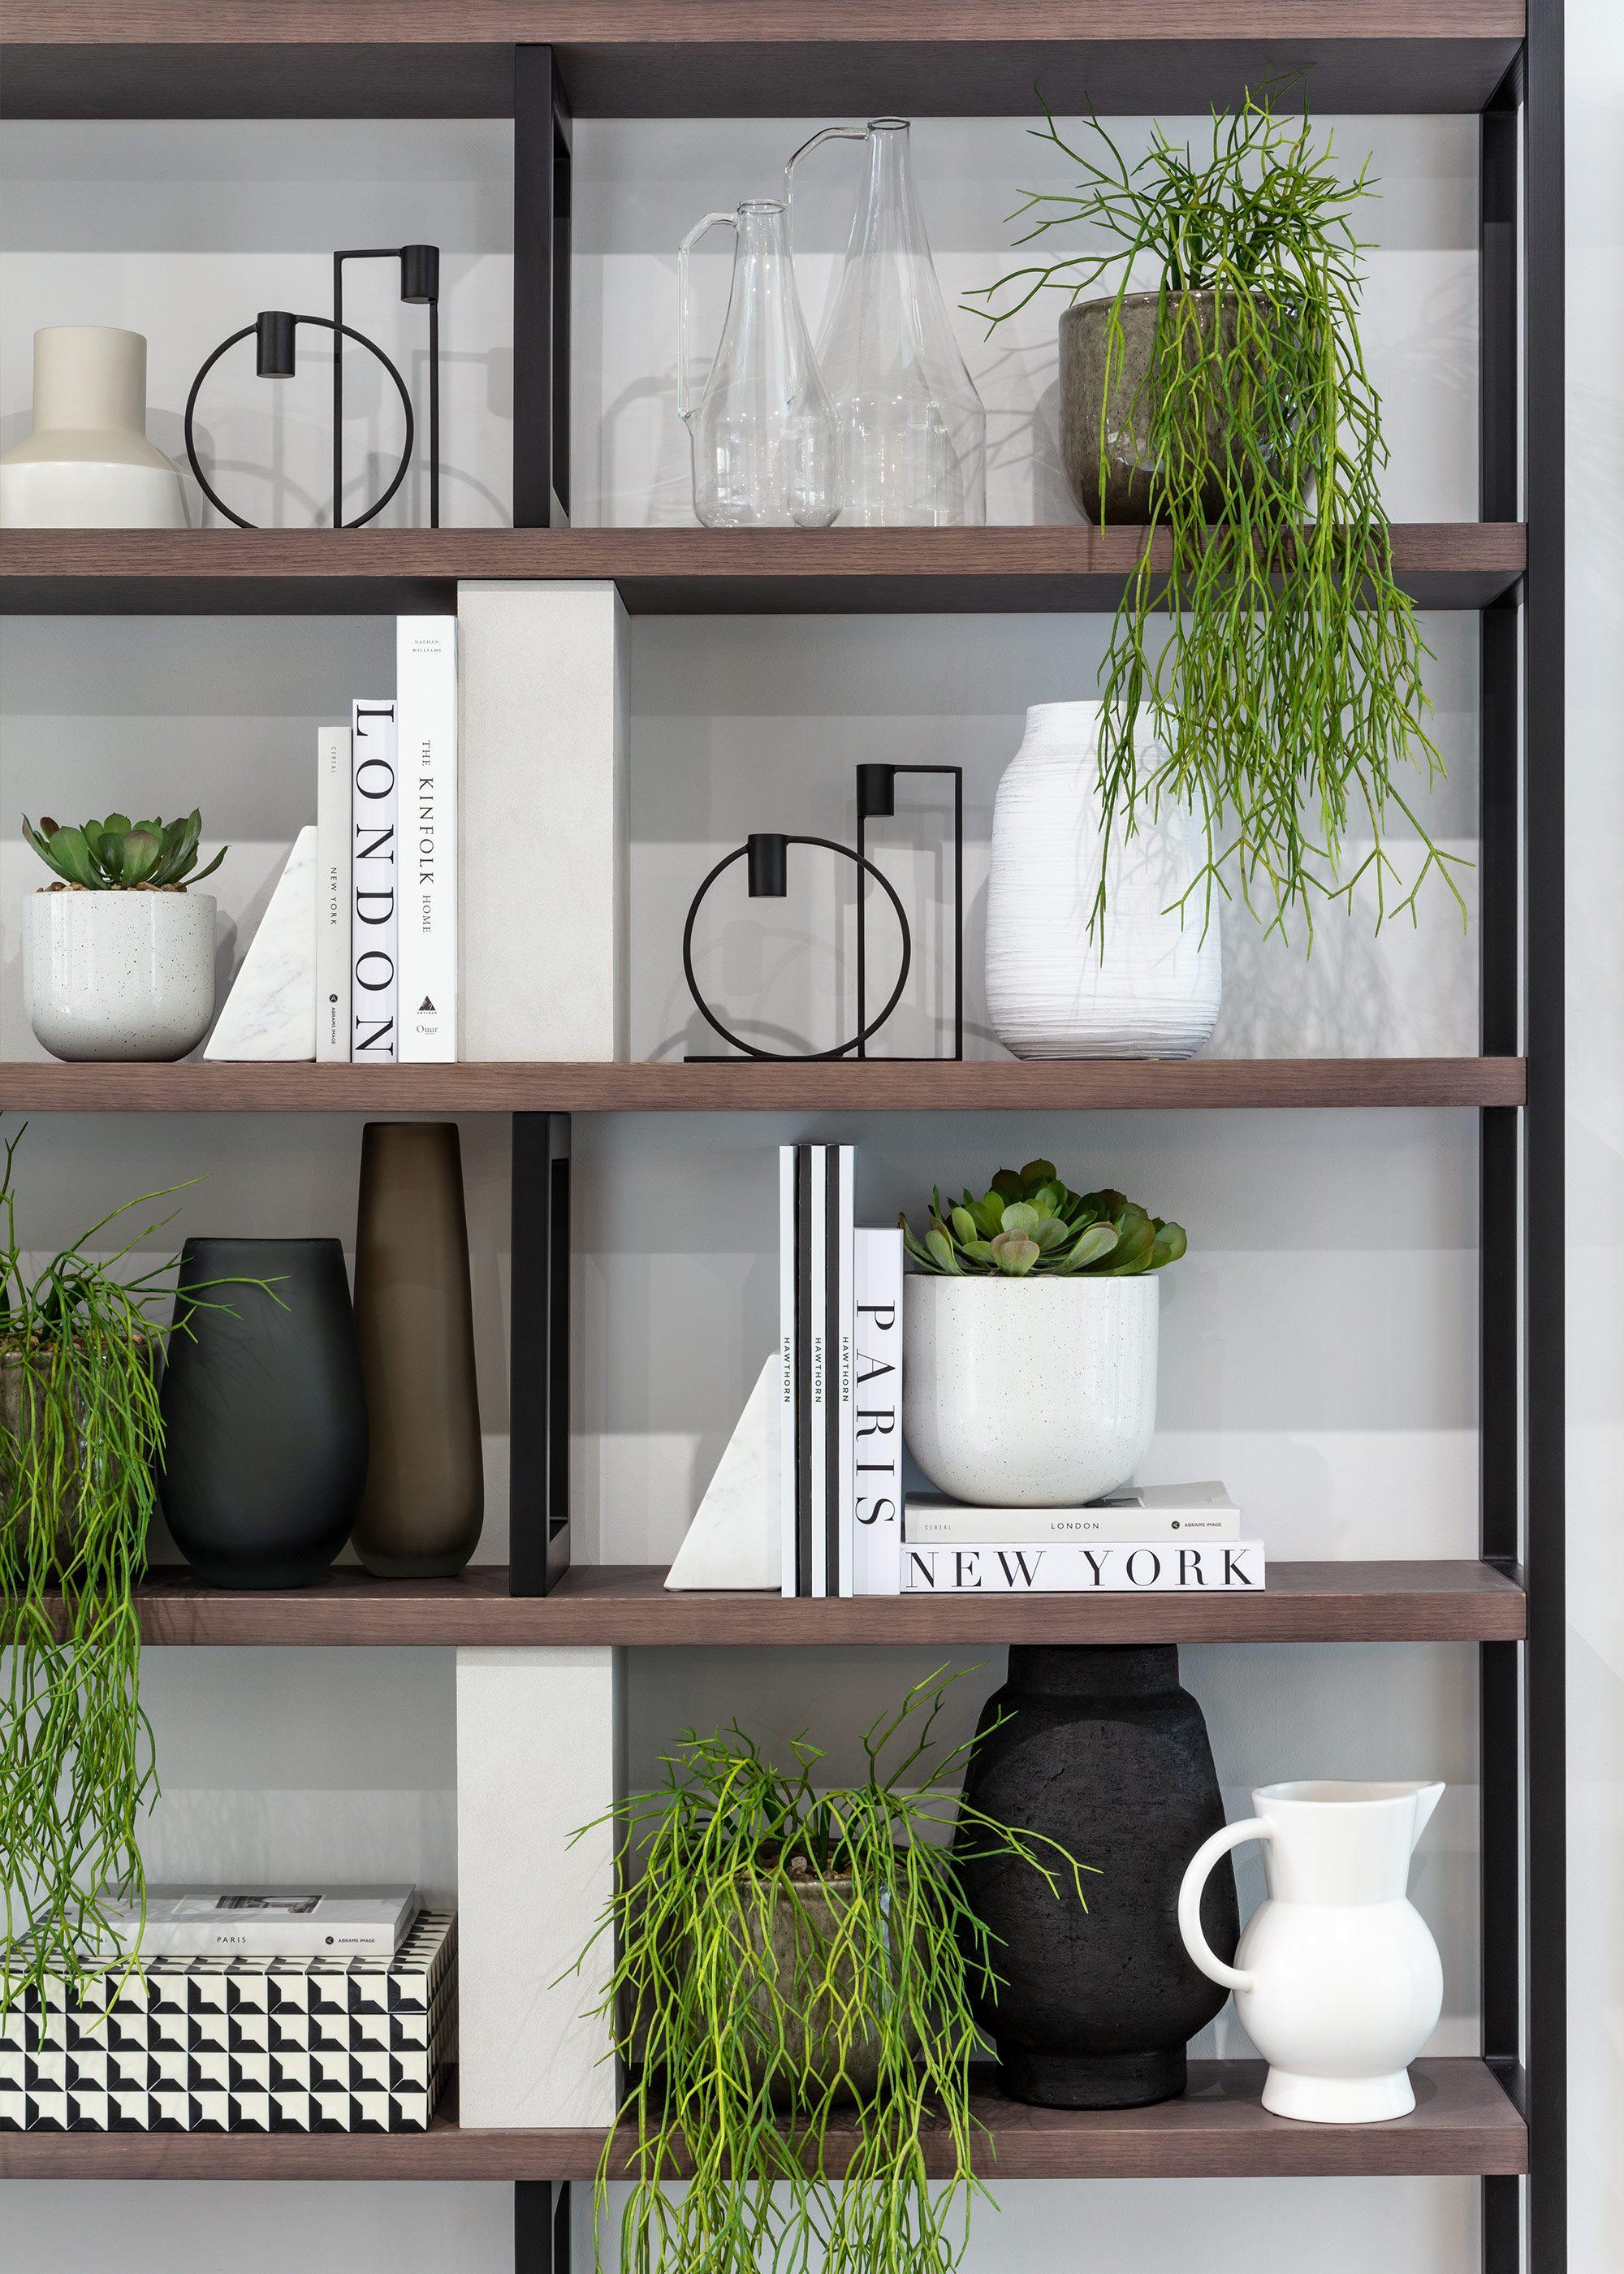 Honky Interior Design Marketing Suites Acton Gardens London Portrait 3